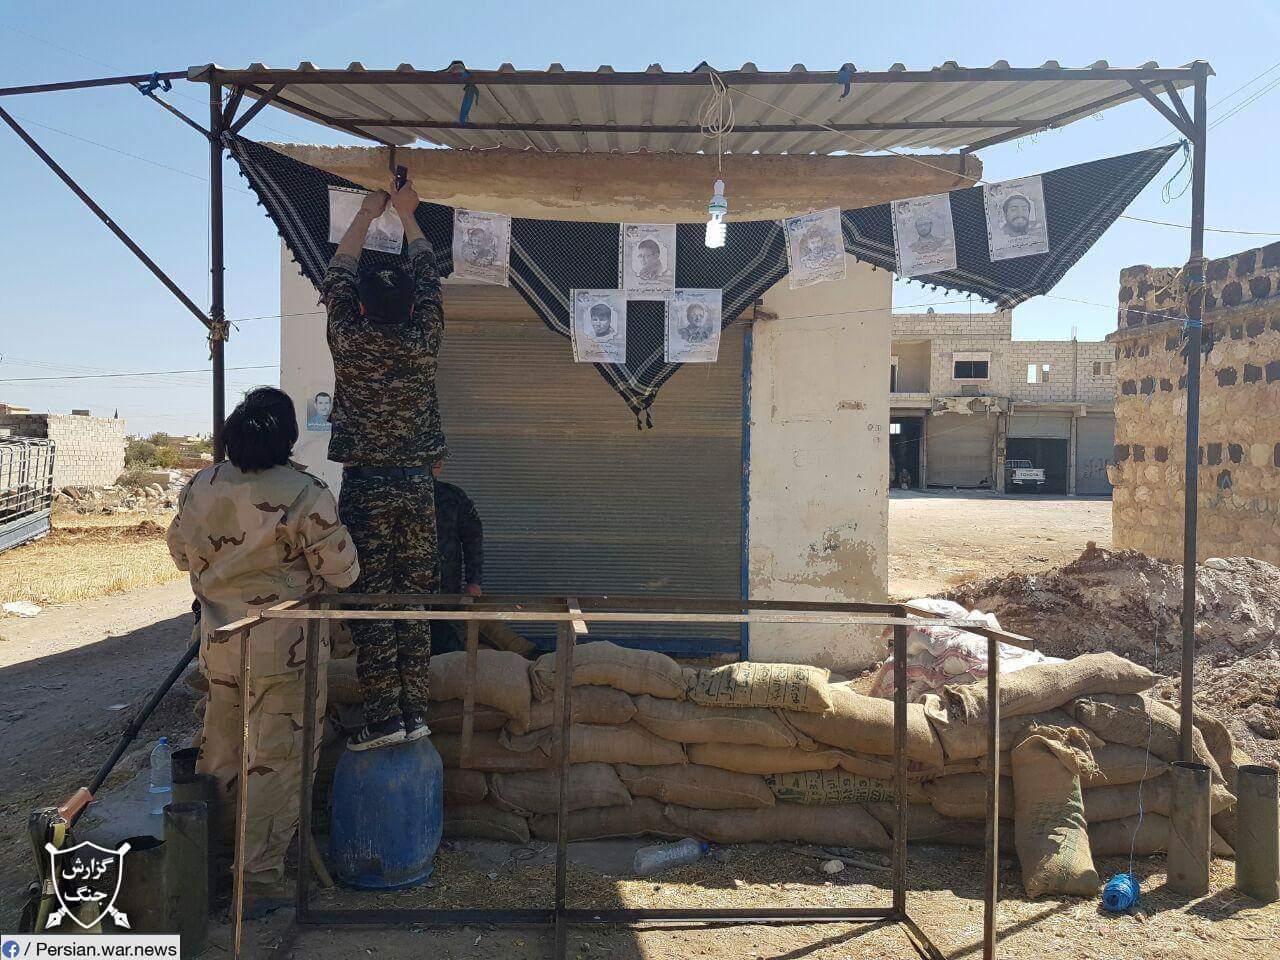 [BIZTPOL] Szíria és Irak - 1. - Page 3 GF5y6Yz2gq8